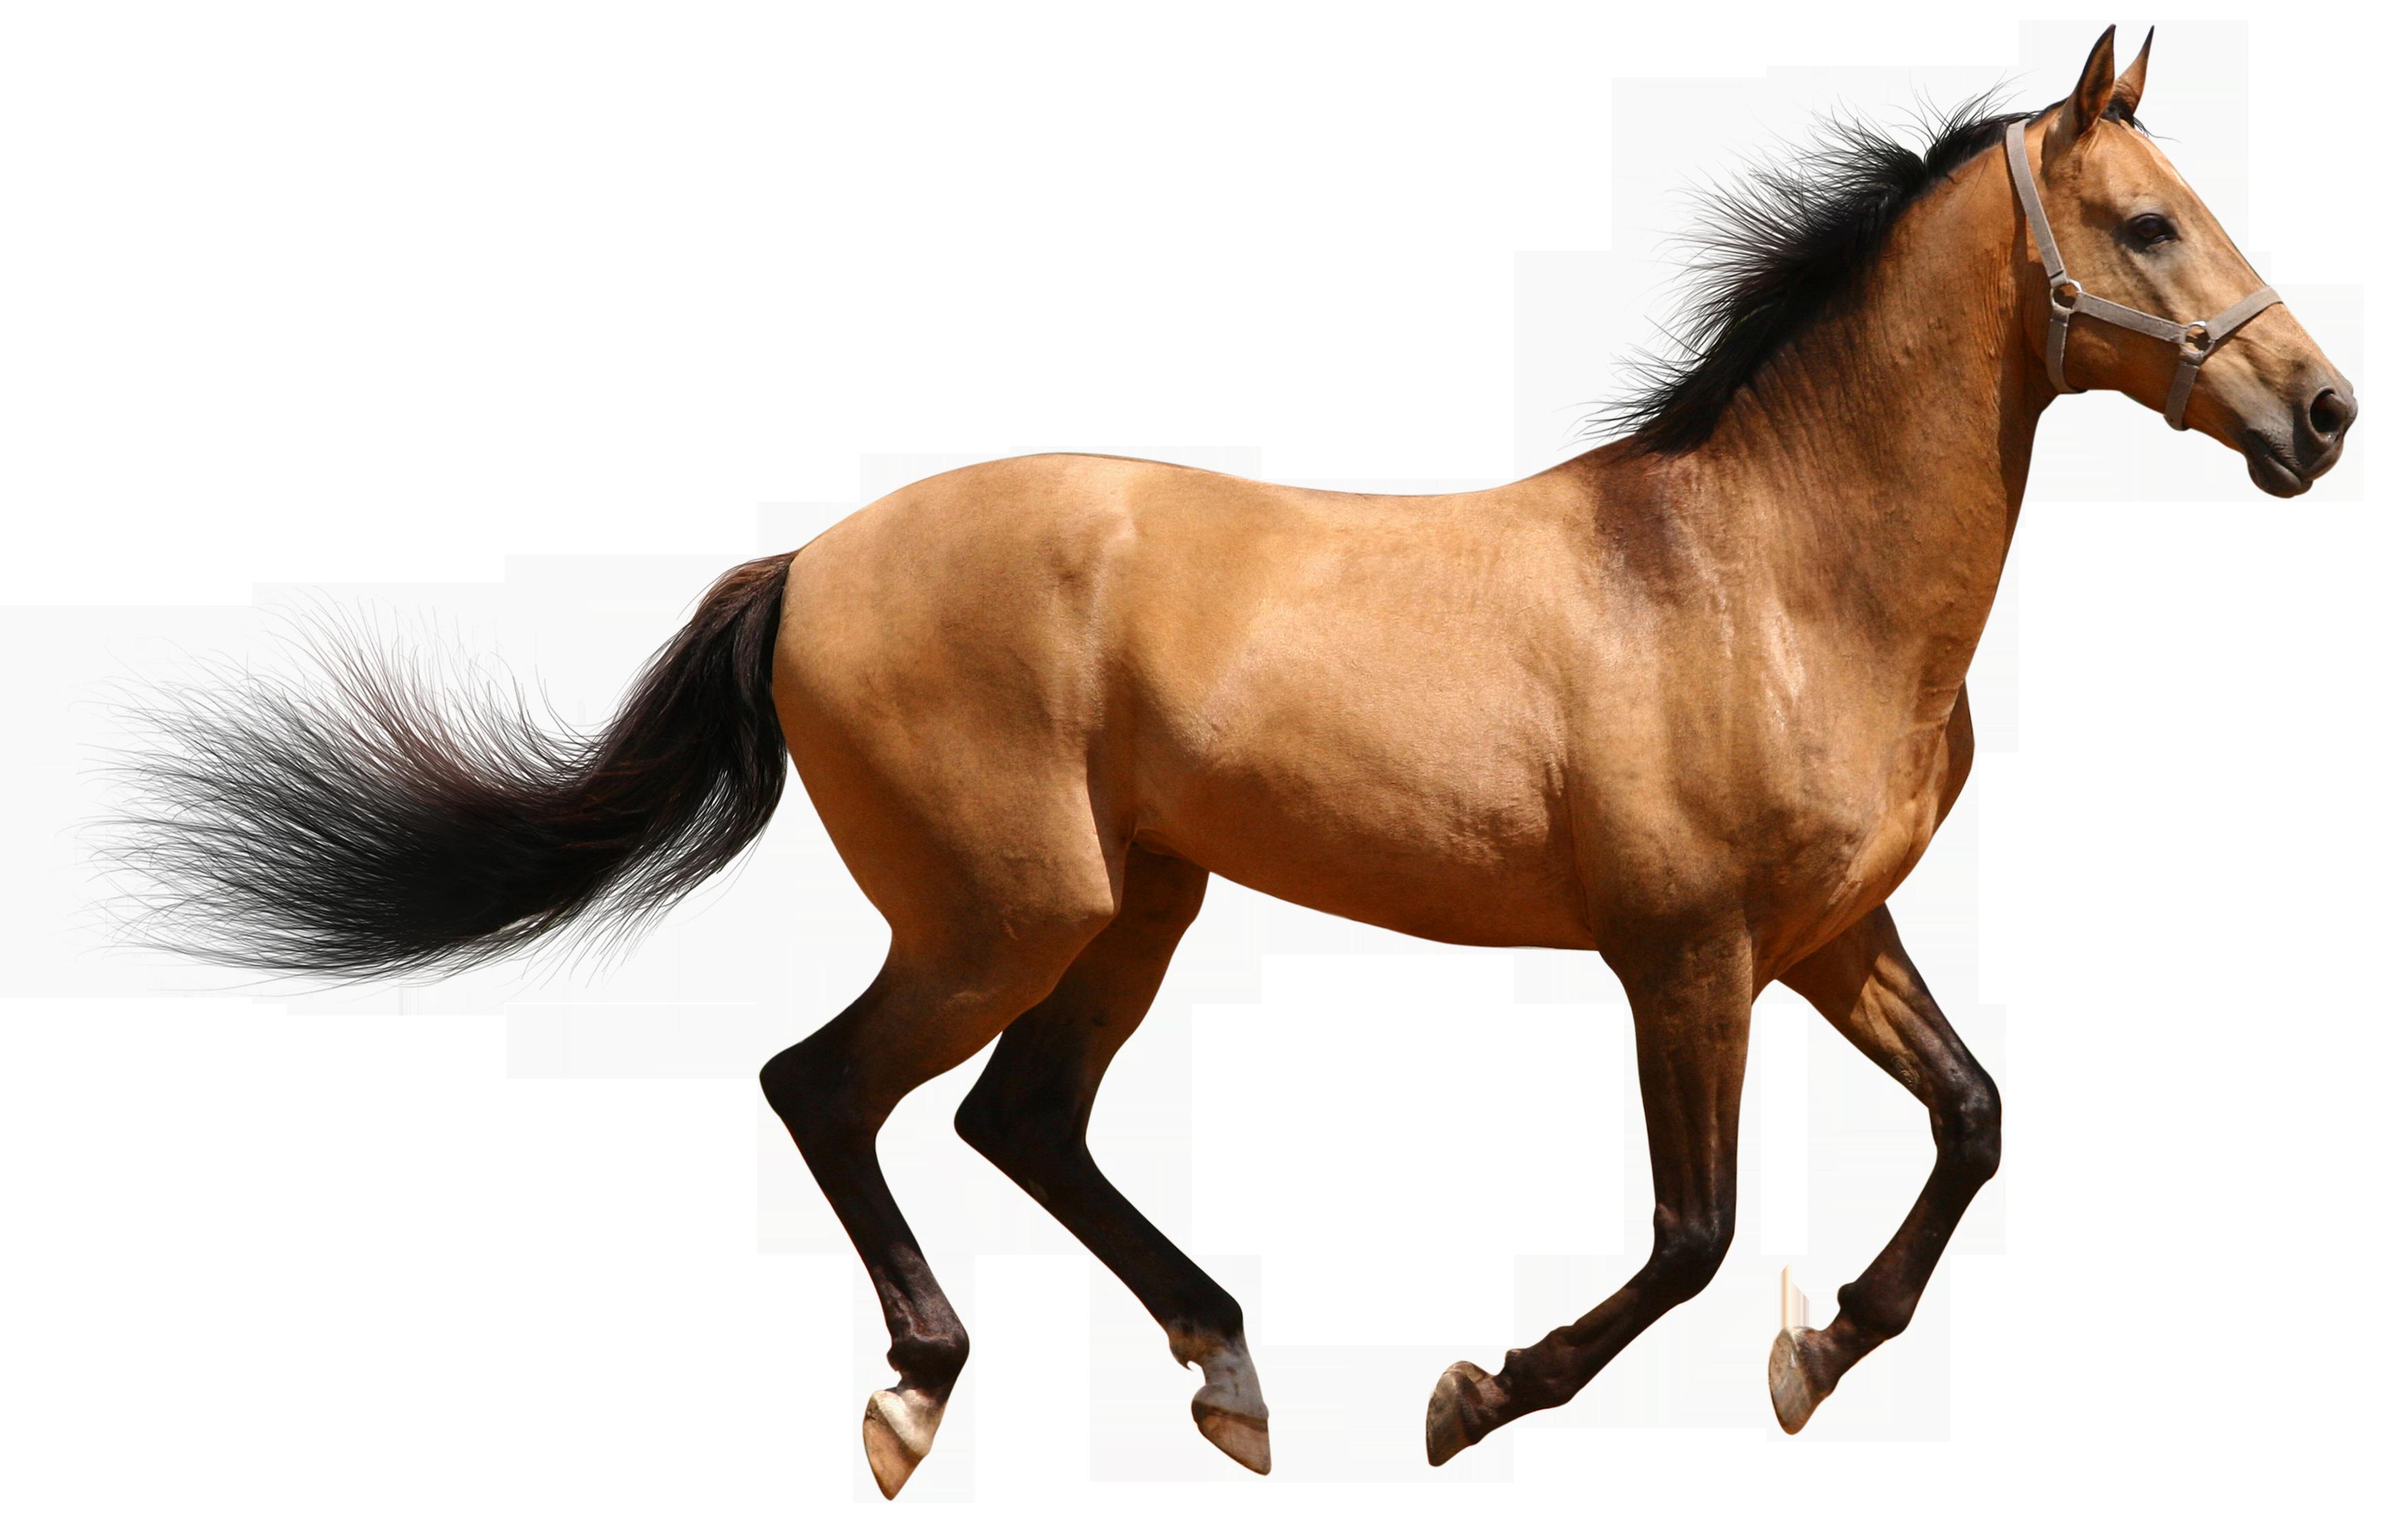 HQ Horse PNG Transparent Horse.PNG Images..